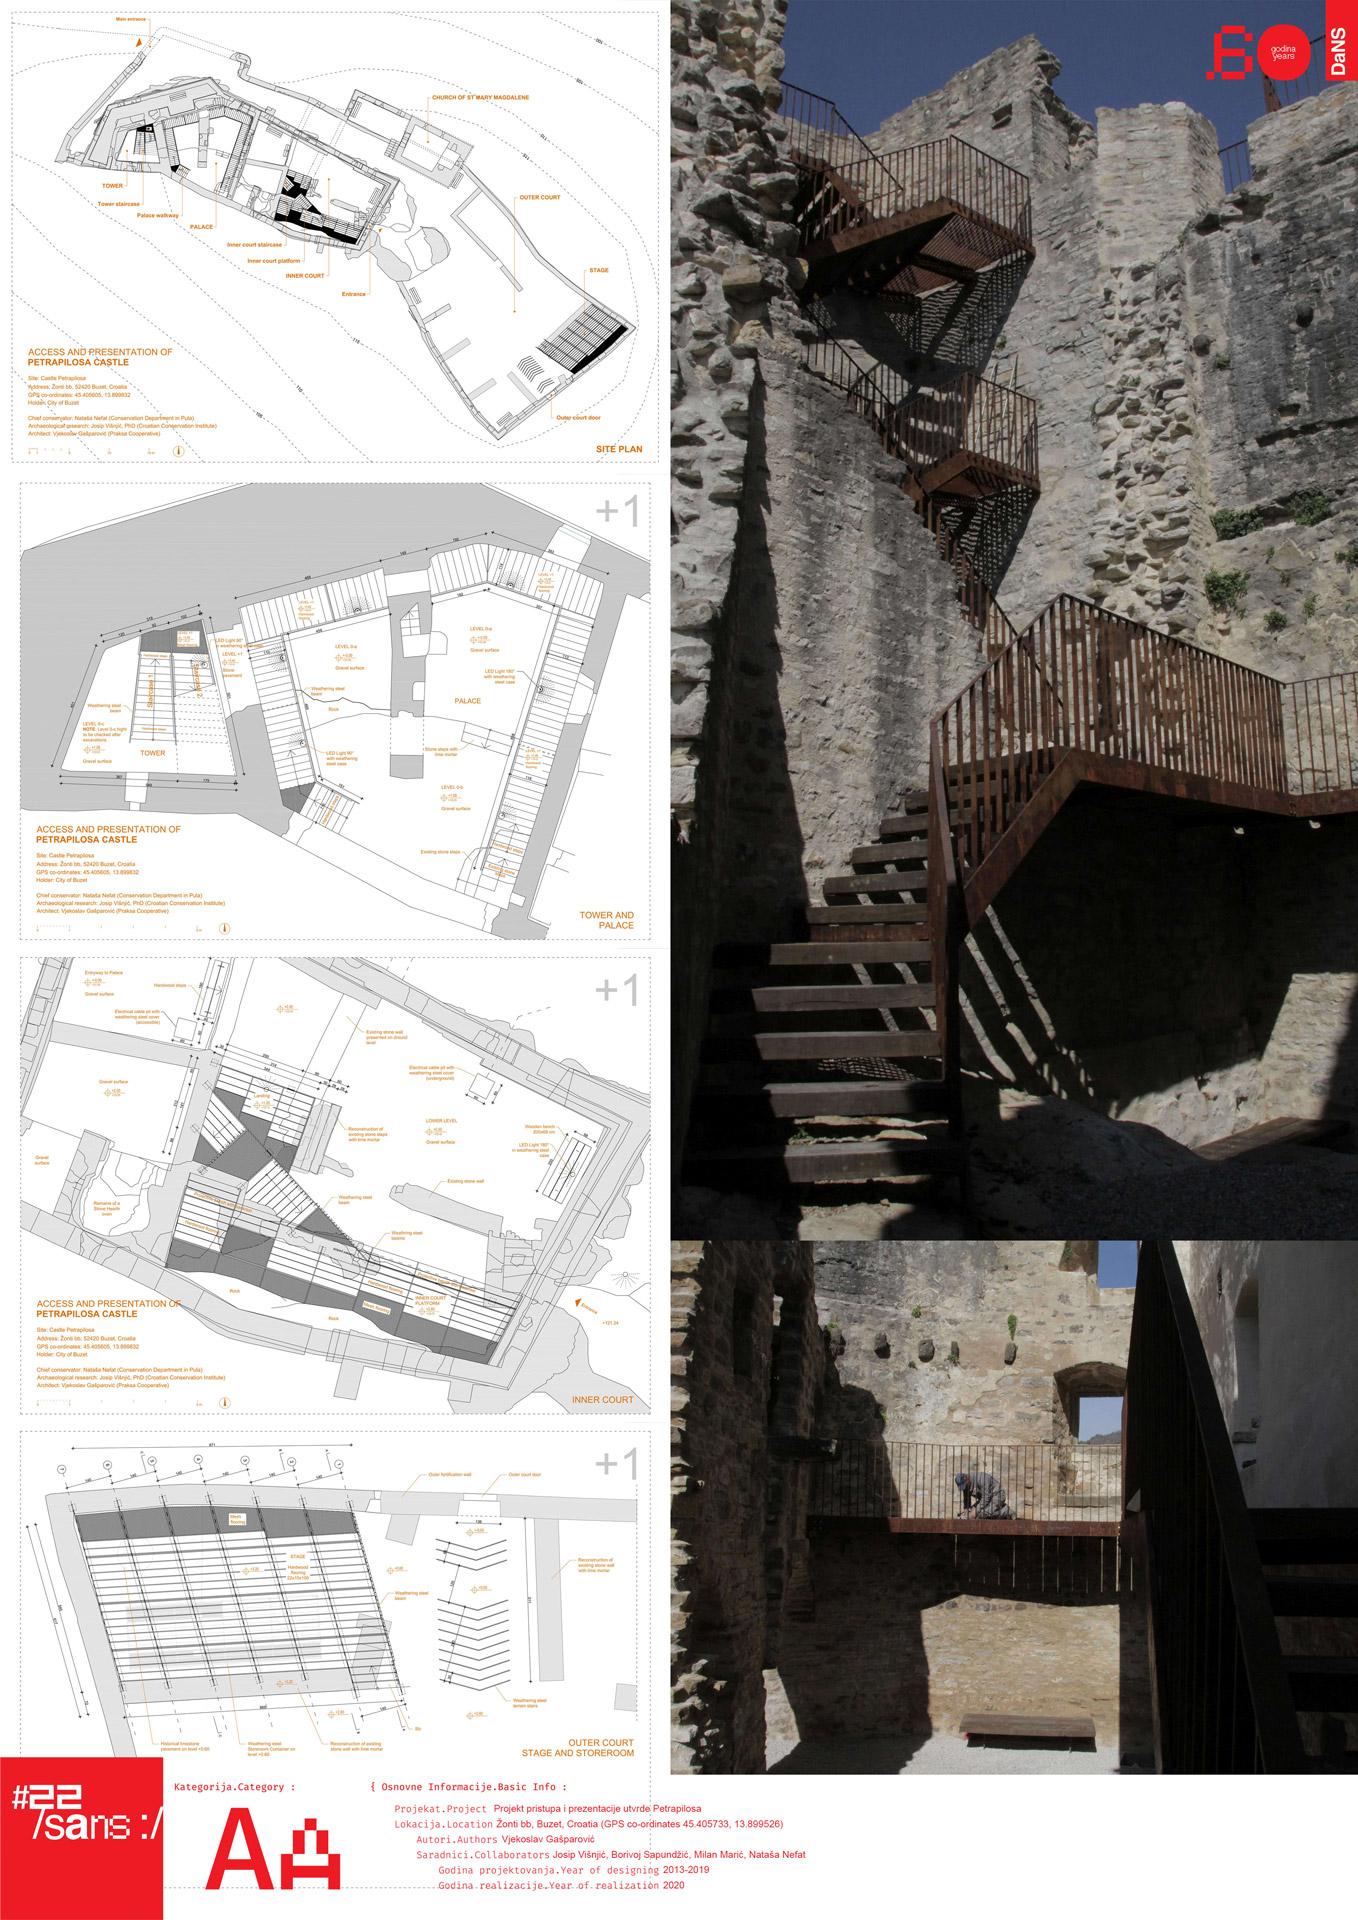 Projekt pristupa i prezentacije utvrde Petrapilosa // Project of the approach and the presentation of the Petrapilos fortress